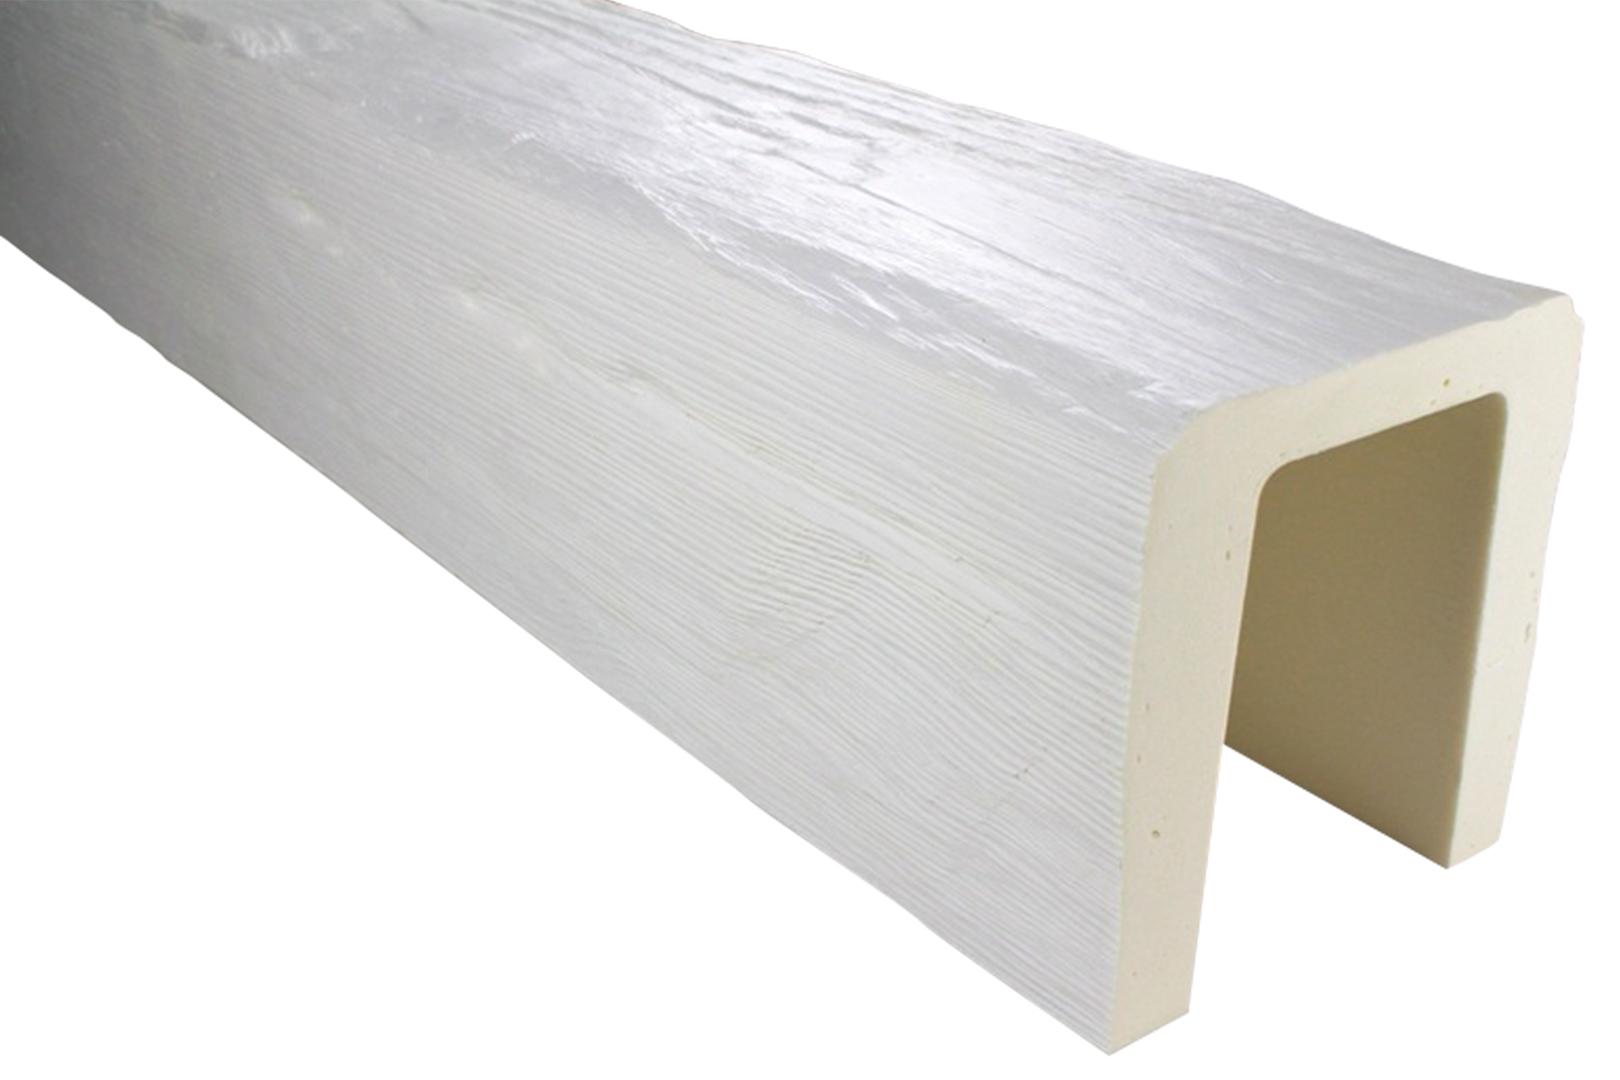 3 Meter Deckenbalken Balken Holzimitat 190x170mm ED104 W Serie Modern